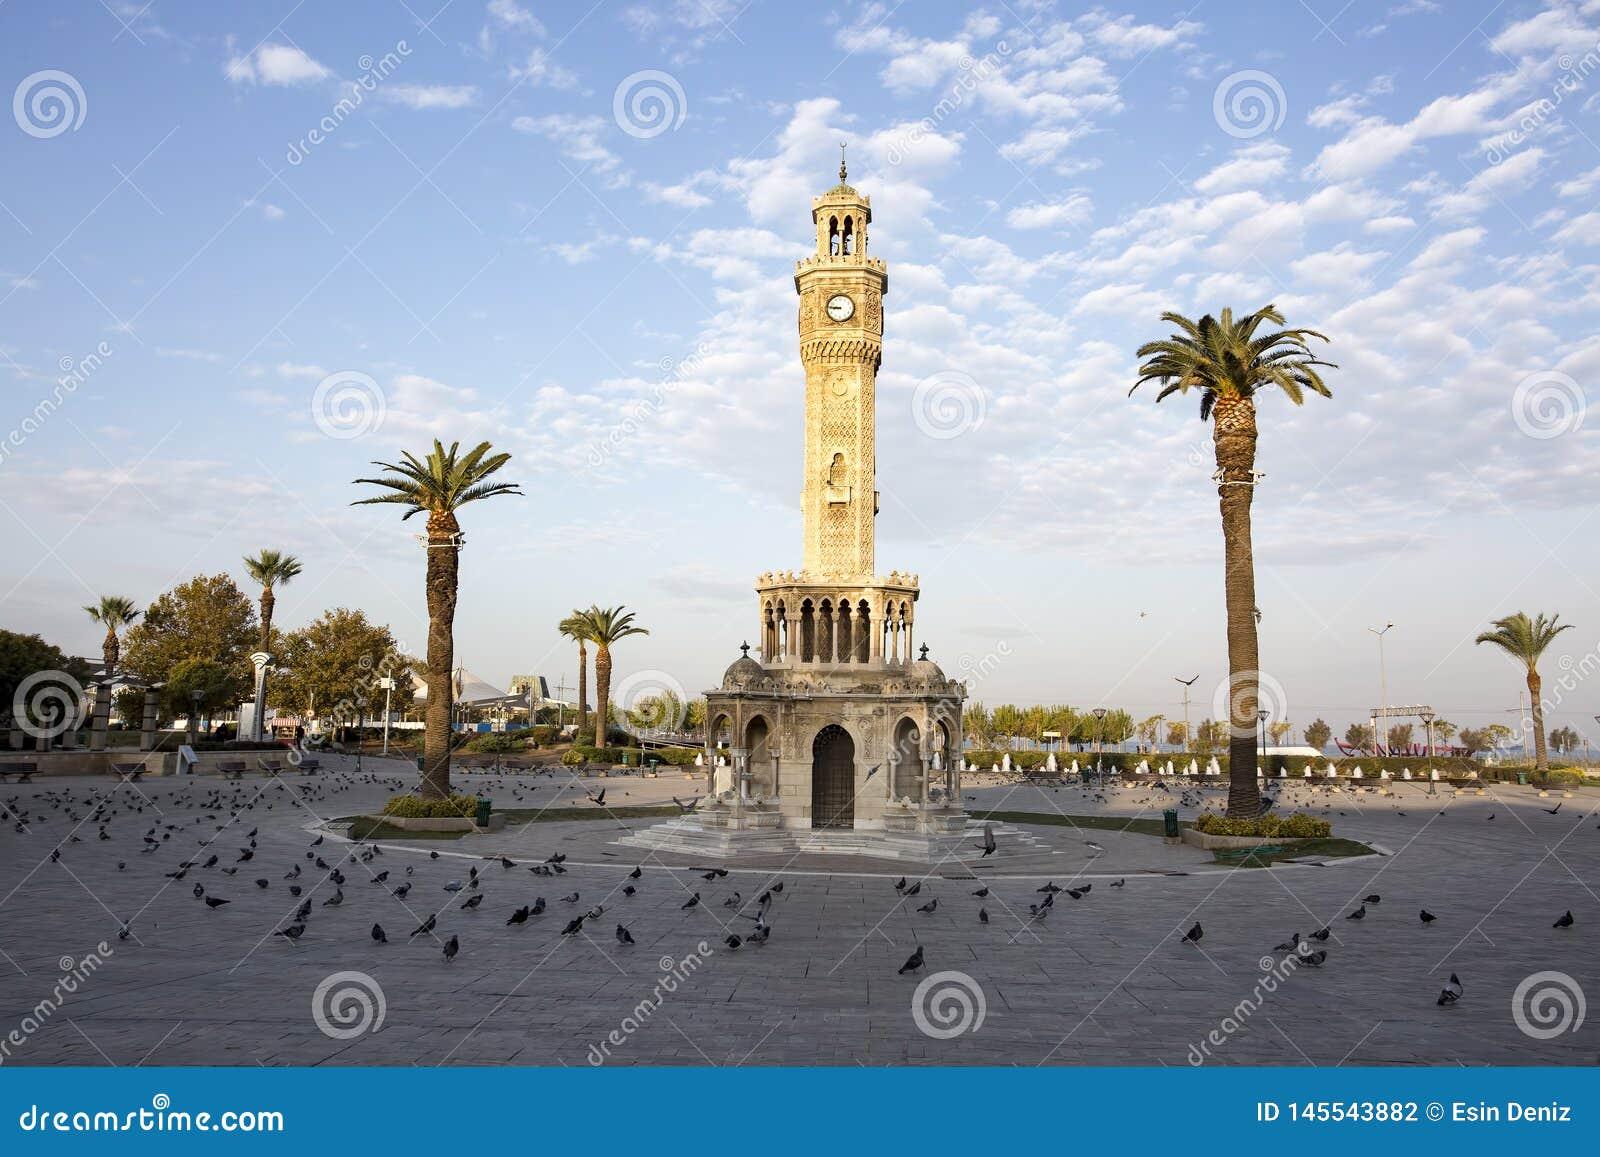 Loppbegreppsfoto; Turkiet/Izmir/Konak/historiskt gammalt klockatorn/Konak fyrkant